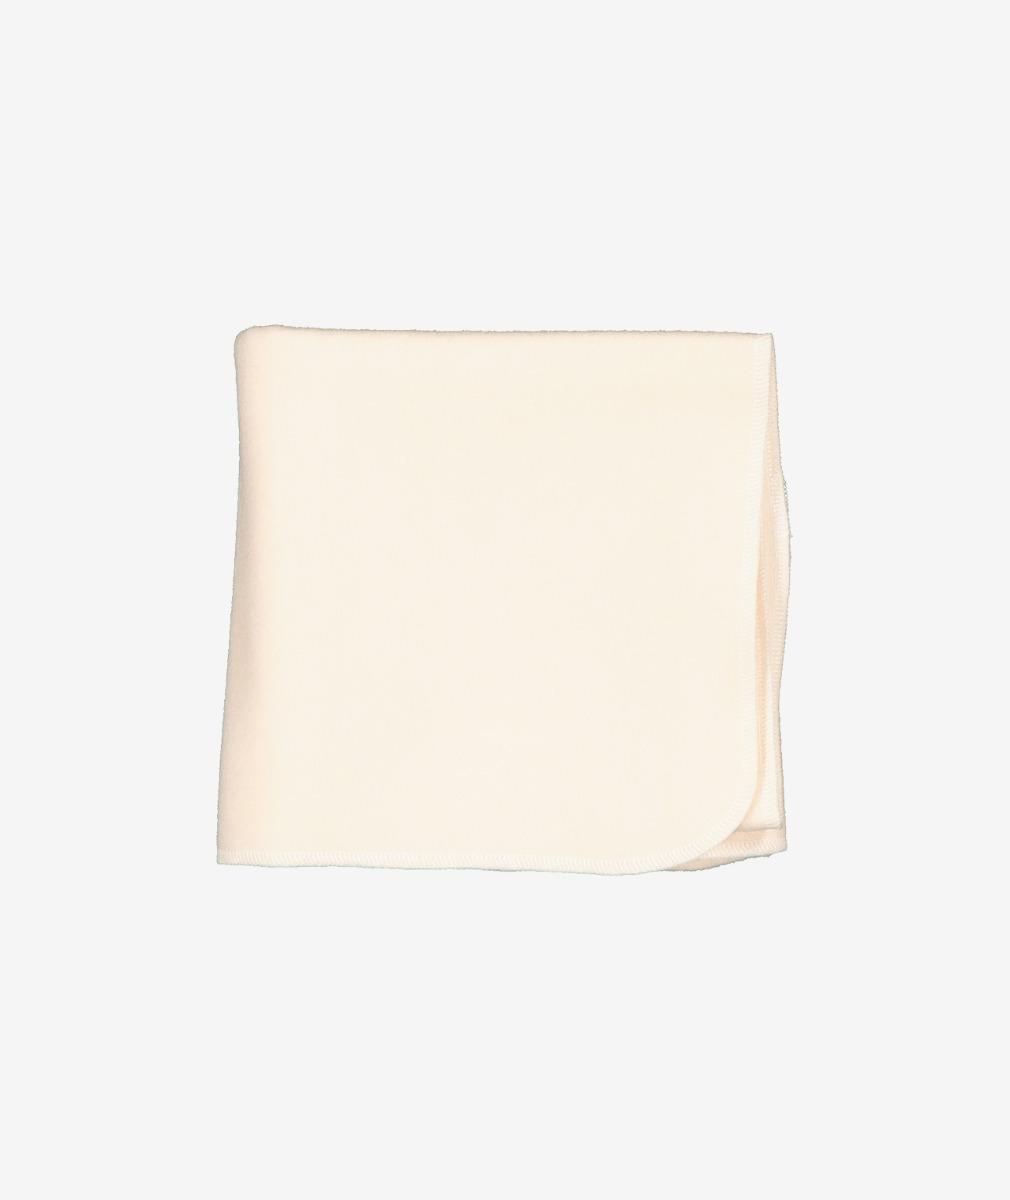 Swanndri Protect-A-Cot 100% Wool Blanket